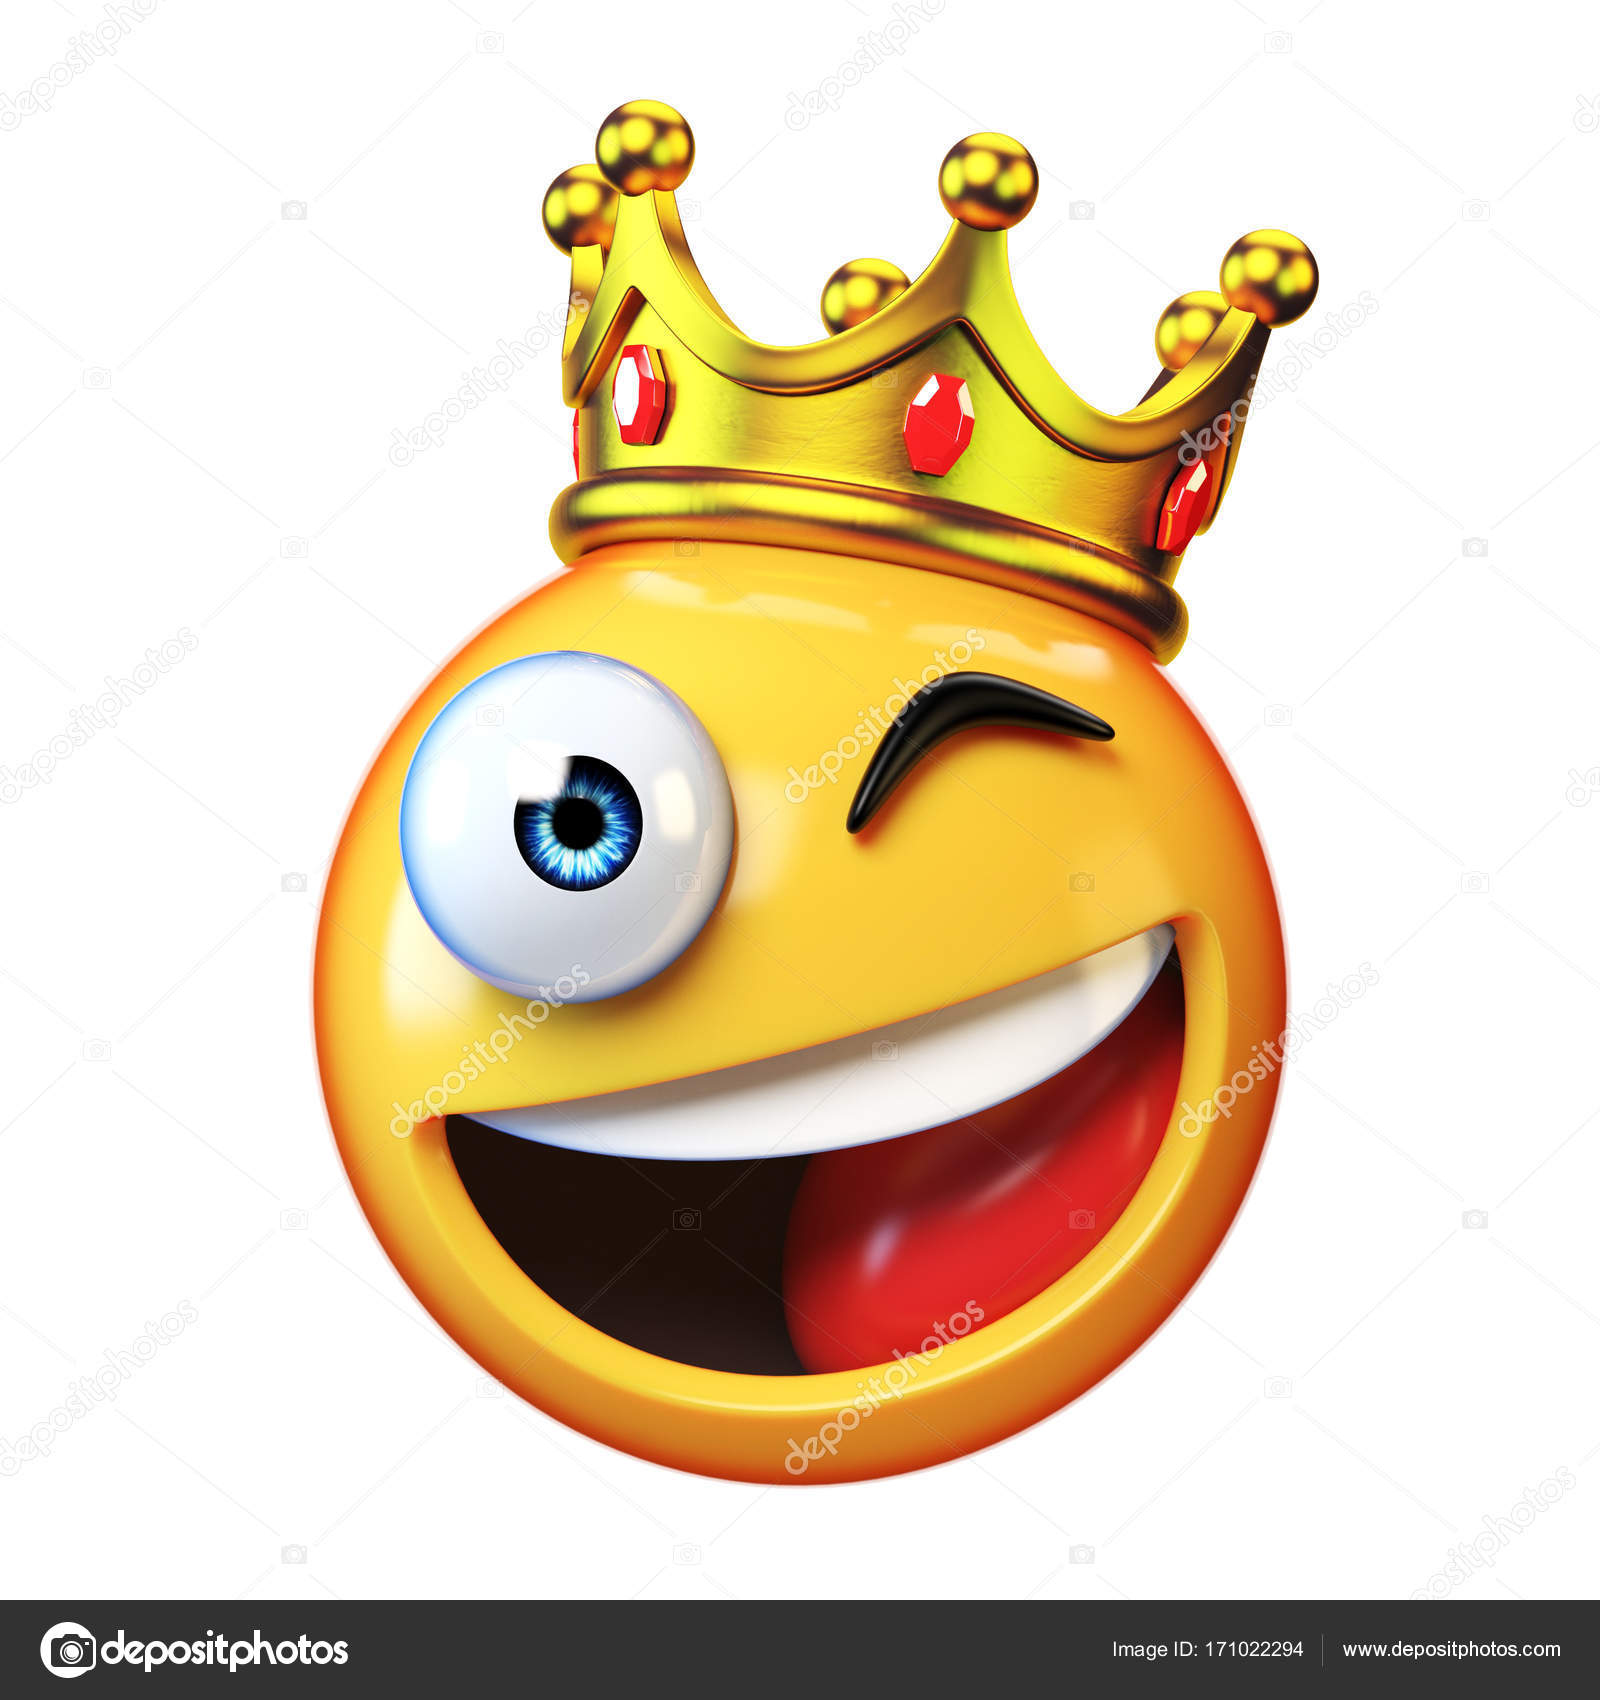 King emoji isolated on white background emoticon wearing crown 3d king emoji isolated on white background emoticon wearing crown 3d rendering stock photo biocorpaavc Gallery